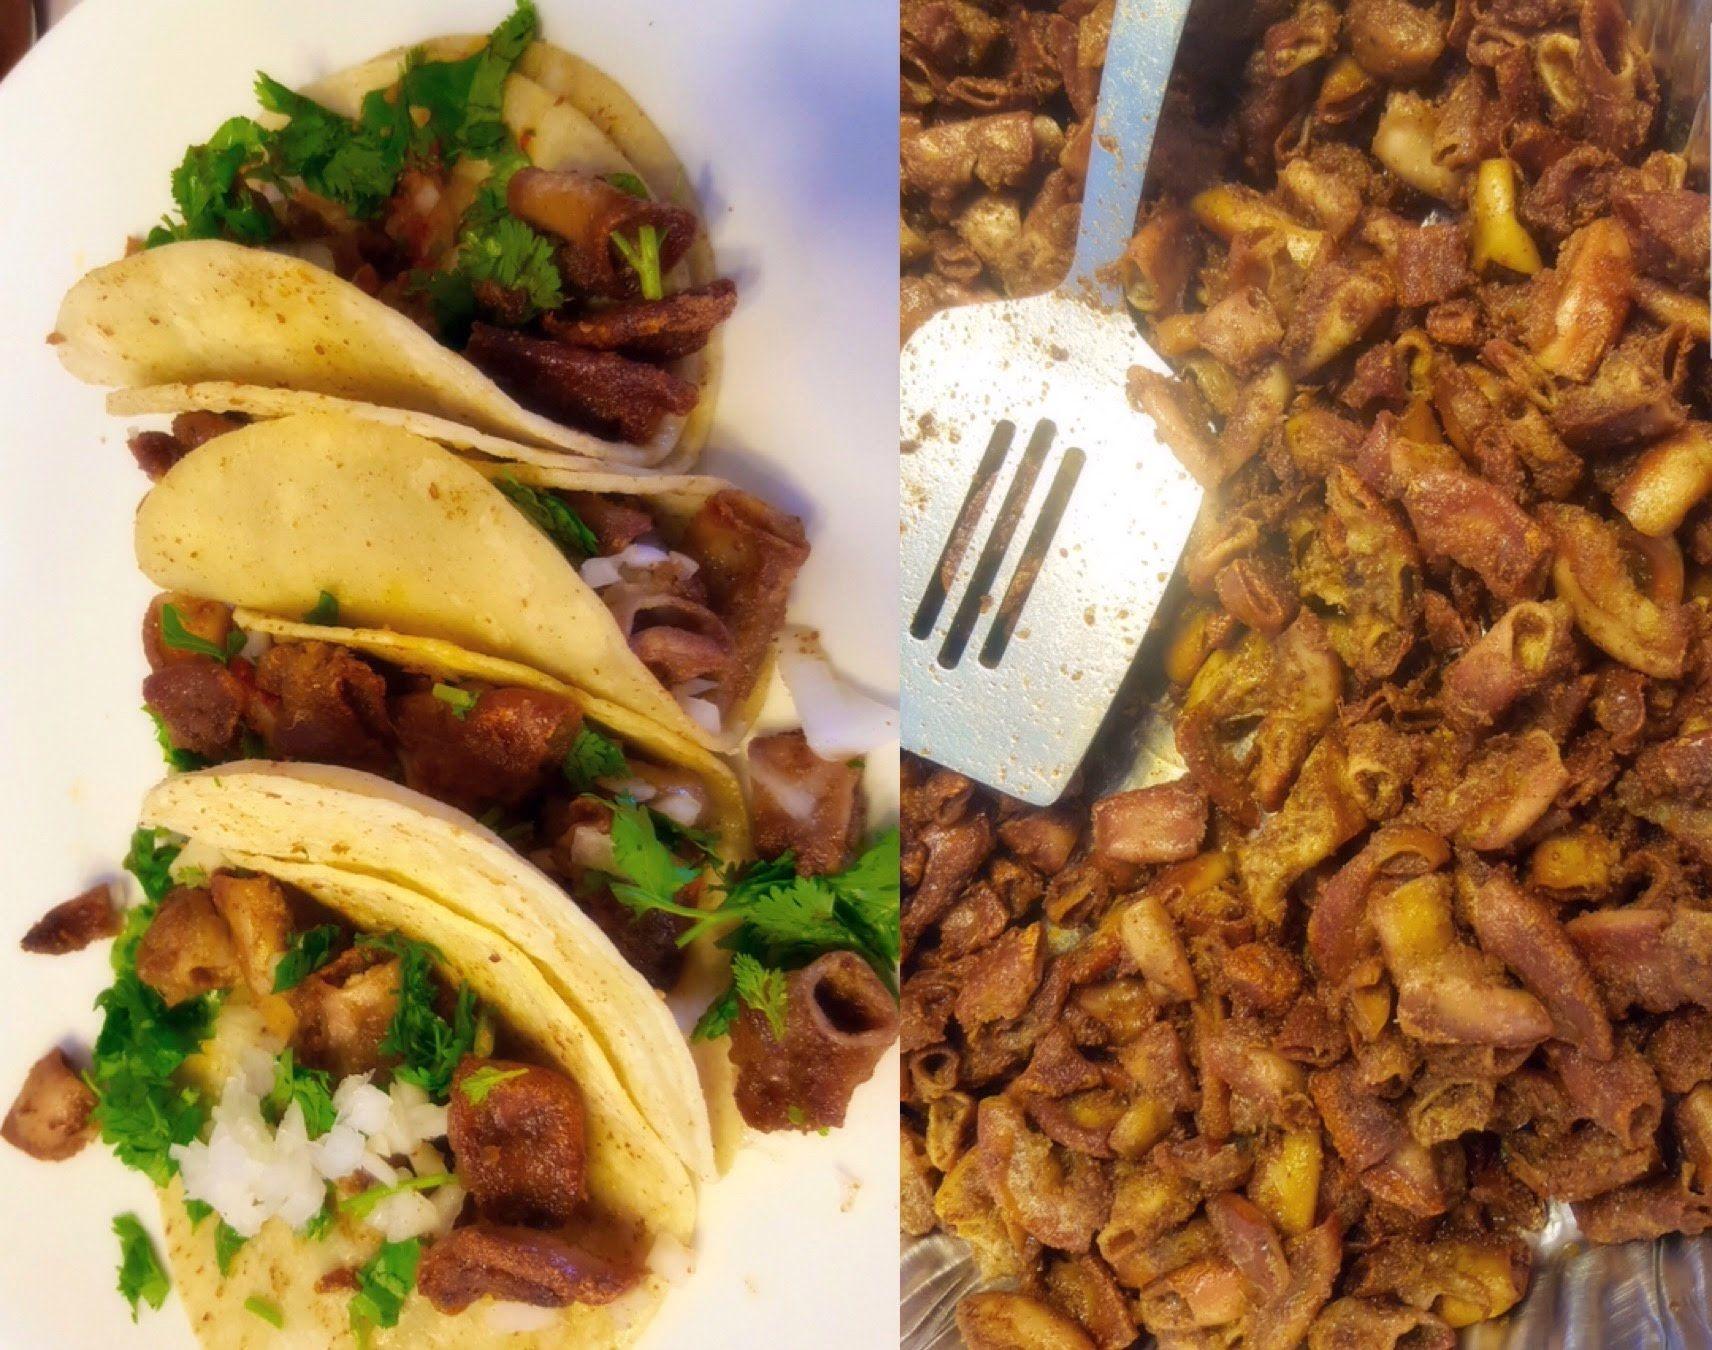 COMO HACER TRIPAS DE RES/TACOS DE TRIPA DE RES PARA NEGOCIO | Receta de  tacos, Recetas de comida mexicana, Comida yucateca